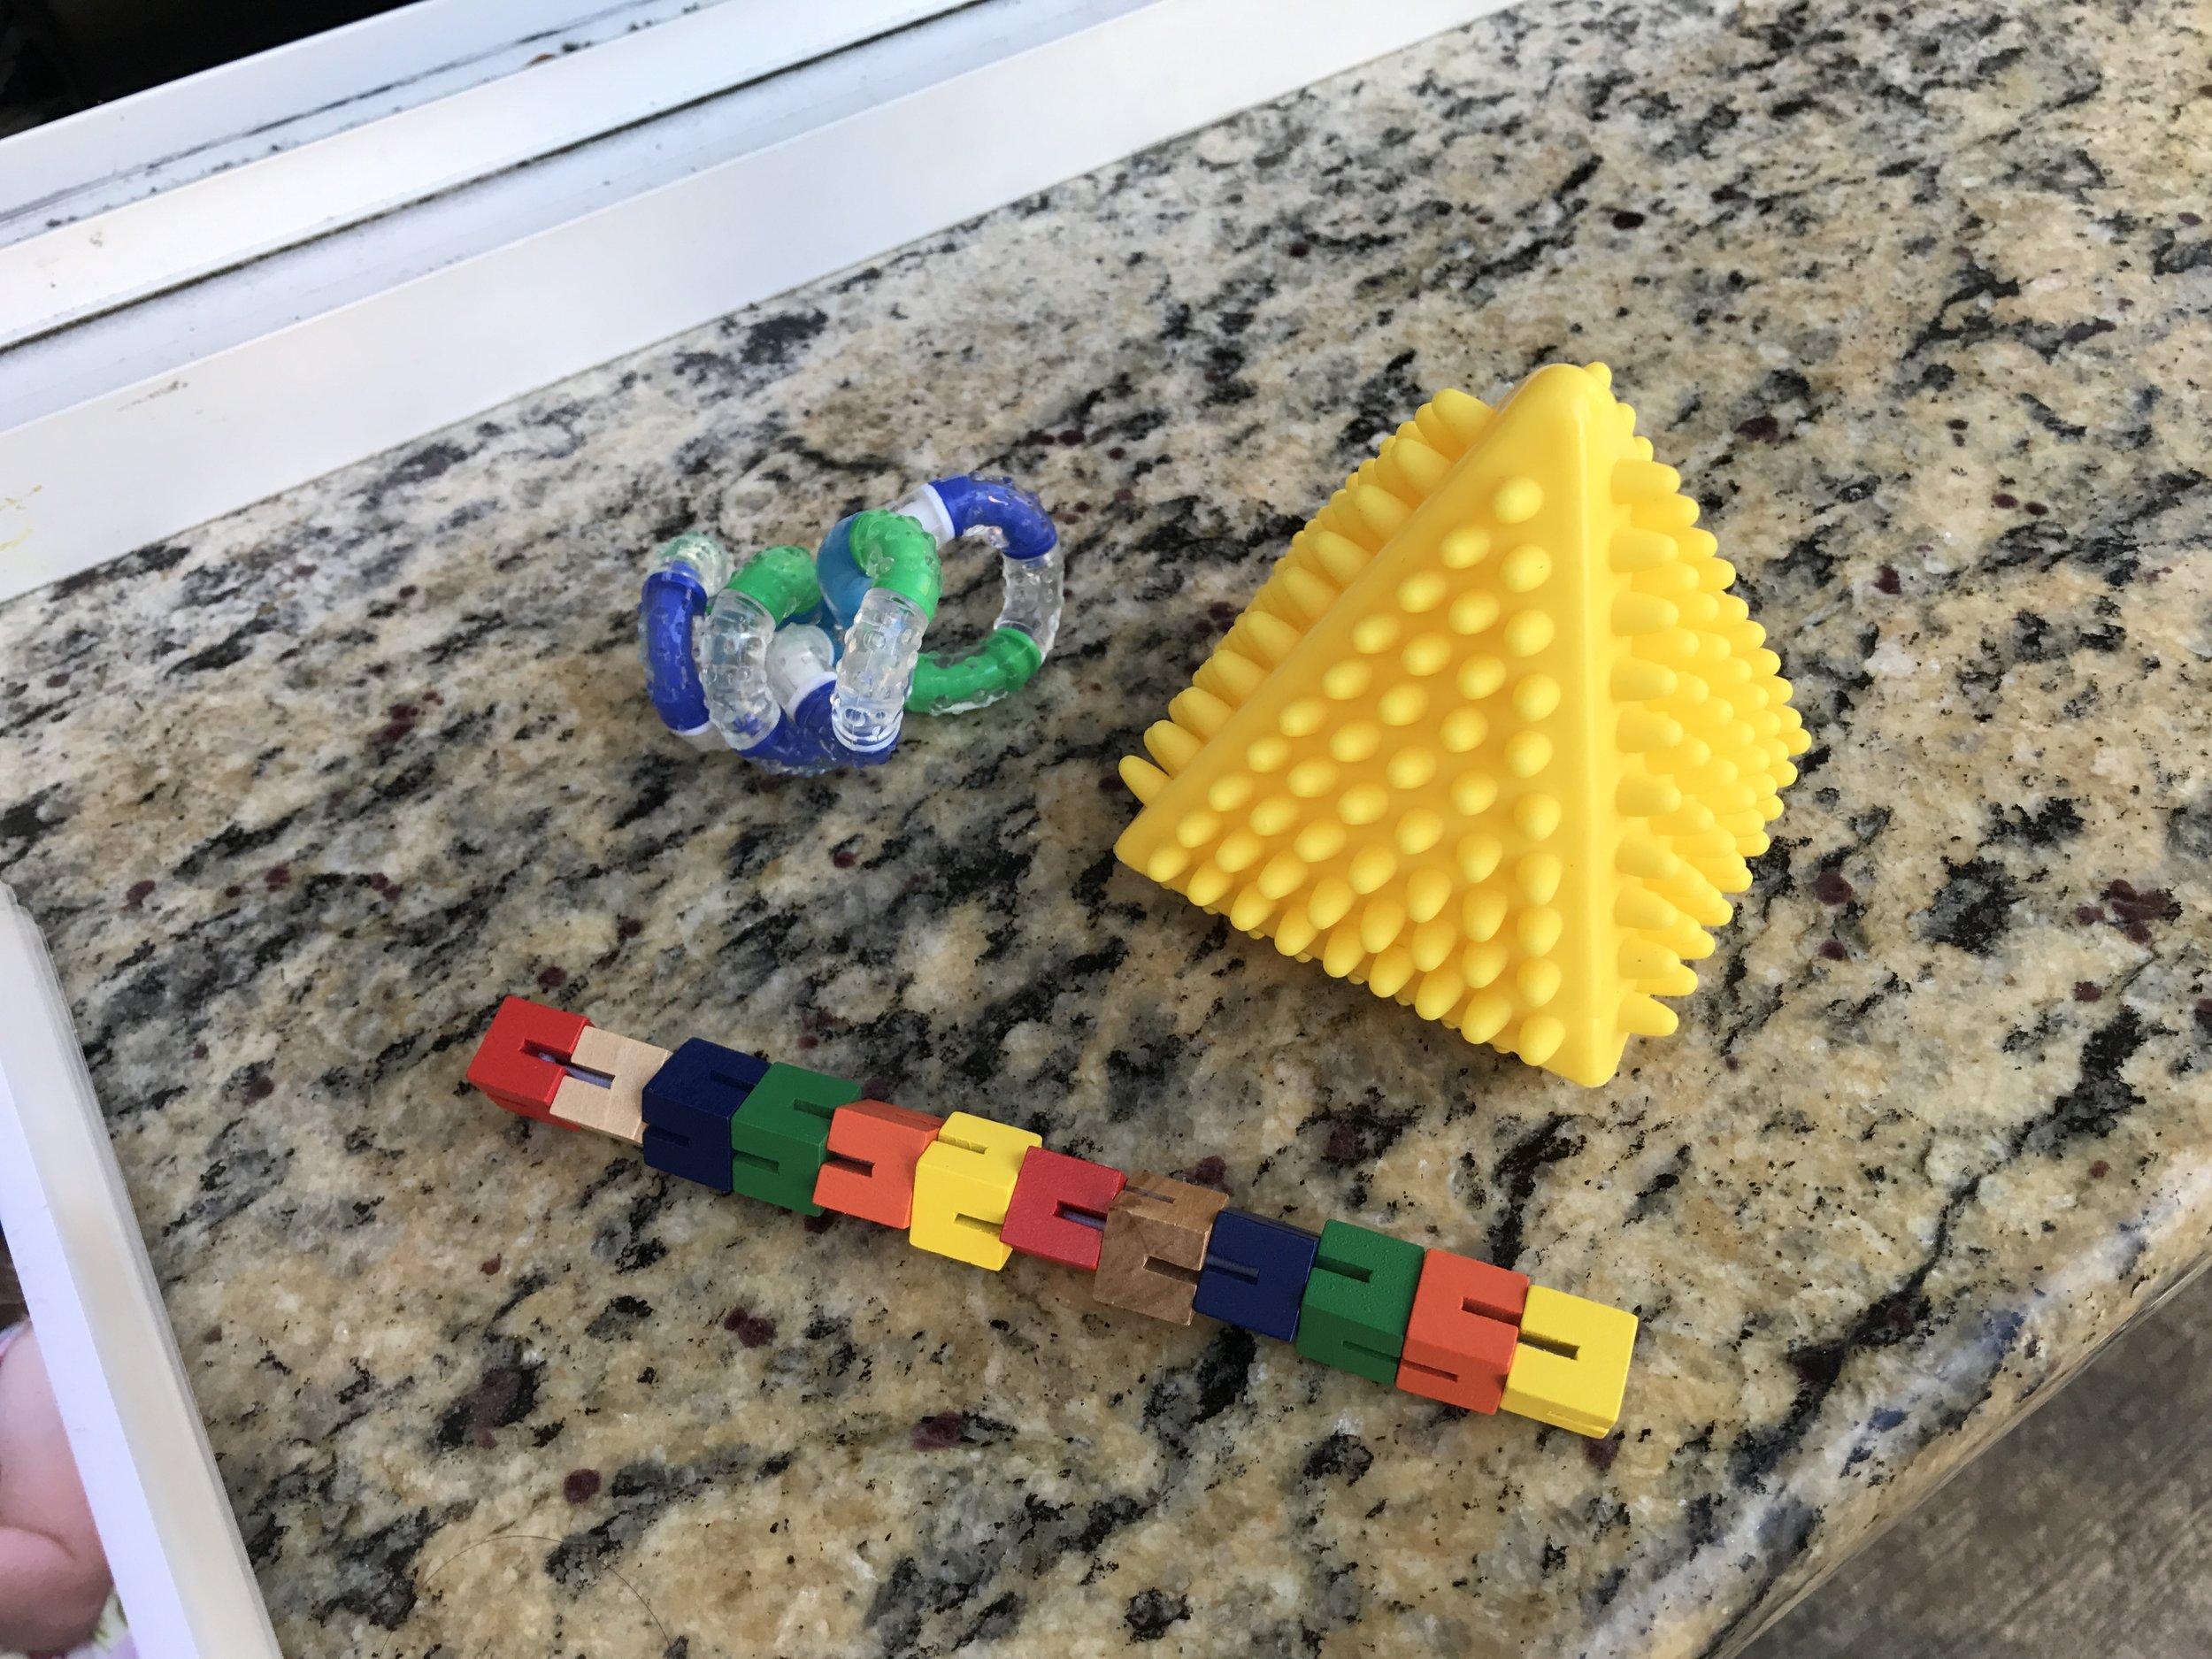 A selection of fidget toys to borrow